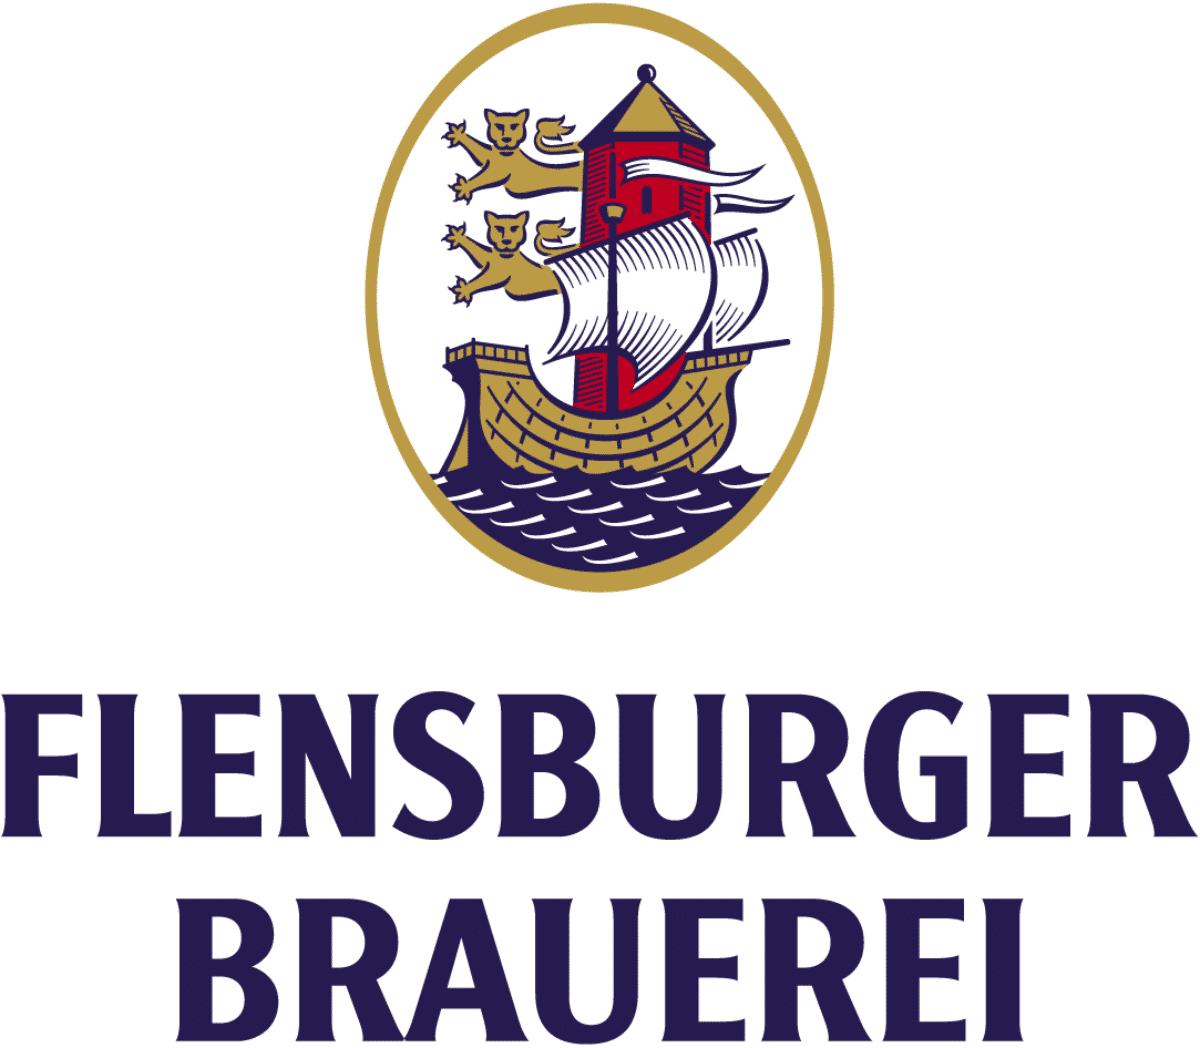 Flensburger Brauerei Emil Petersen GmbH & Co. KG Munketoft 12 D-24937 Flensburg https://www.flens.de/